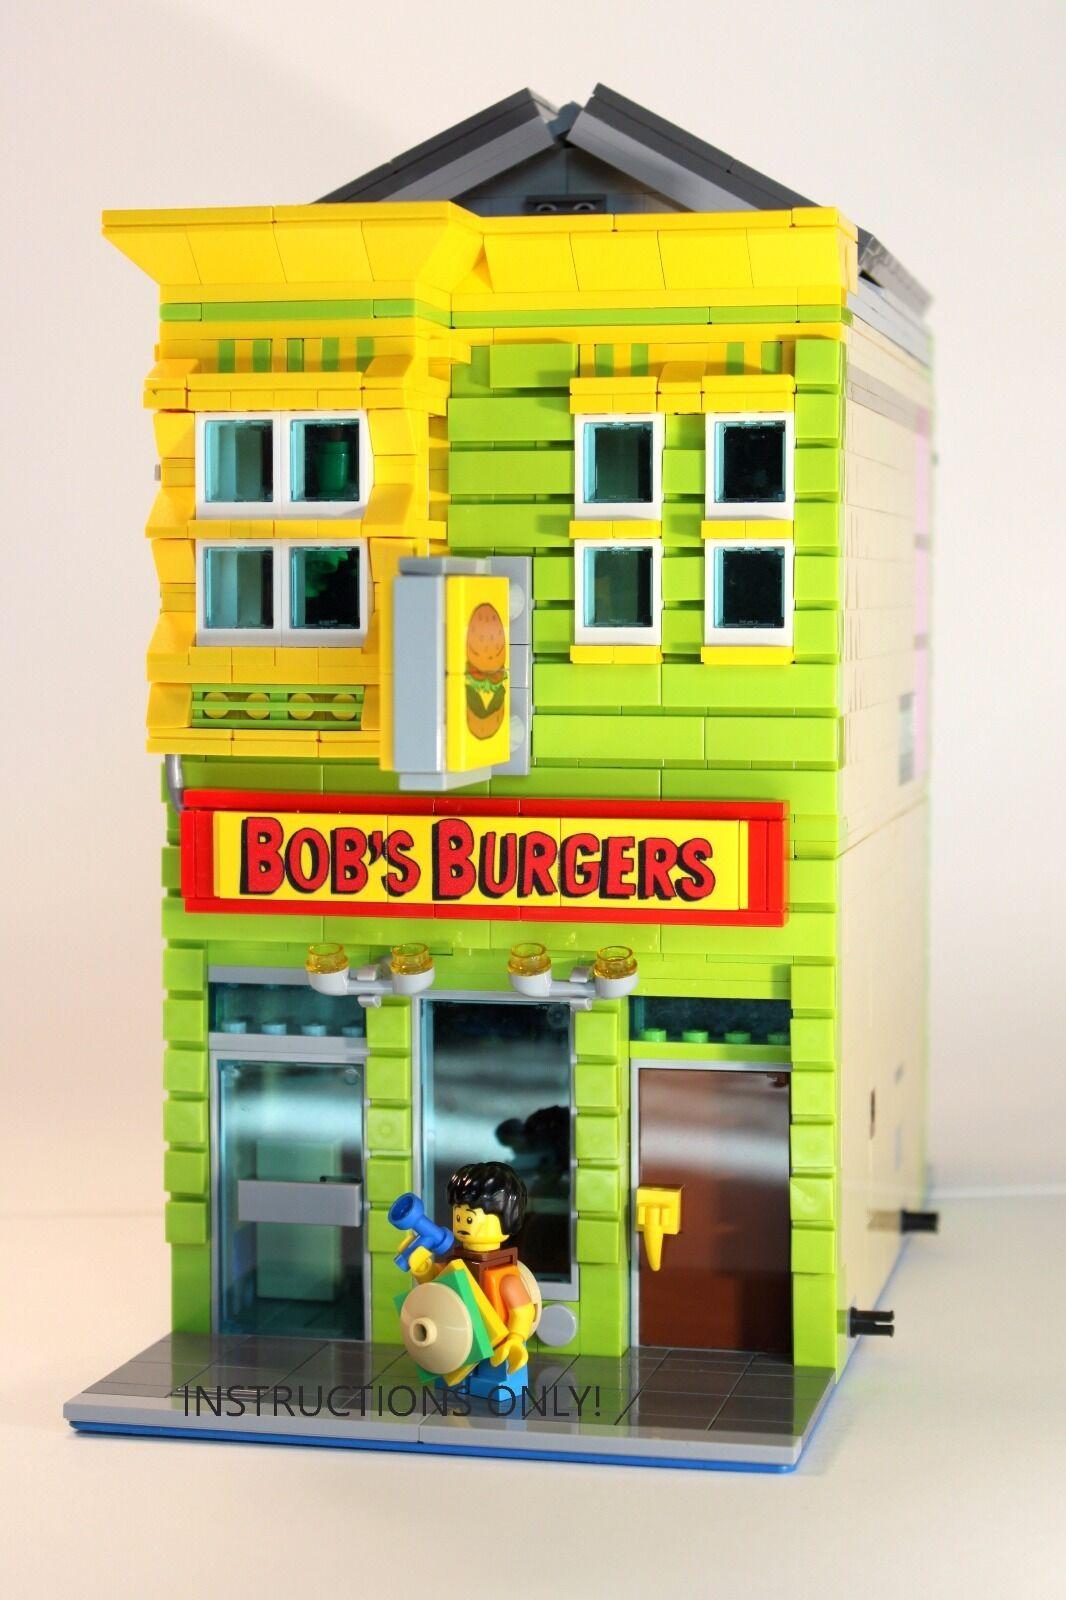 Lego Custom Modular Building Bobs Burgers Instructions Only Ebay